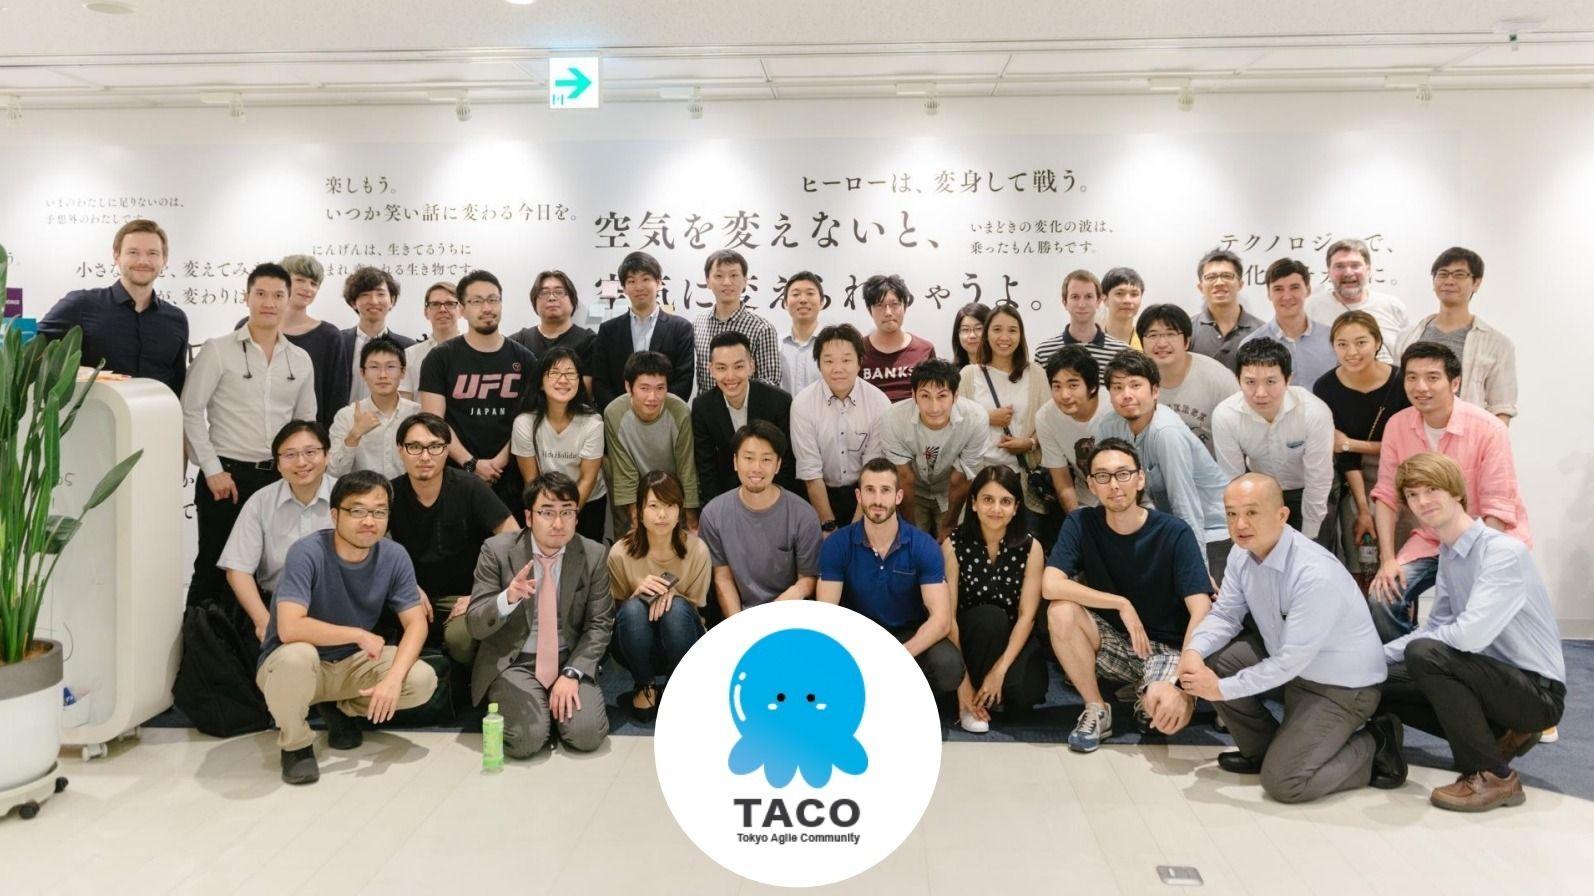 Tokyo Agile Community (TACO)